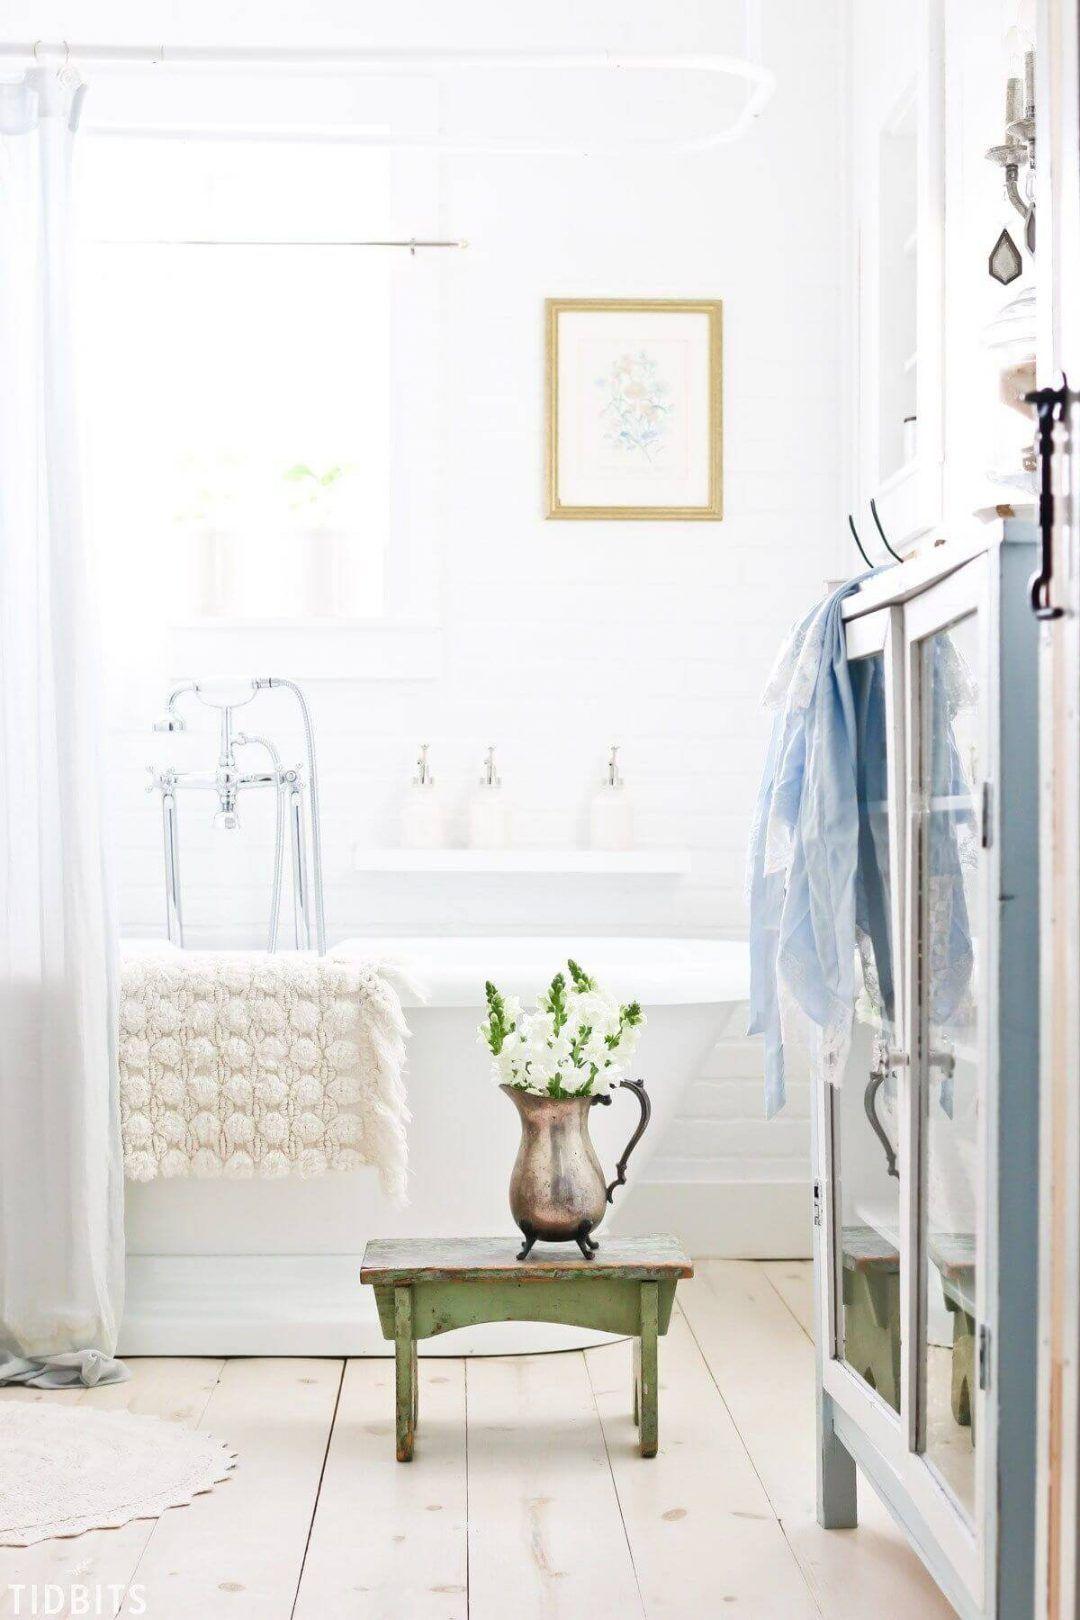 25 Stunning Shabby Chic Bathroom Designs That Will Adore You - 119Df6D3Ea64609D5Fdf53B0E559B7Fc